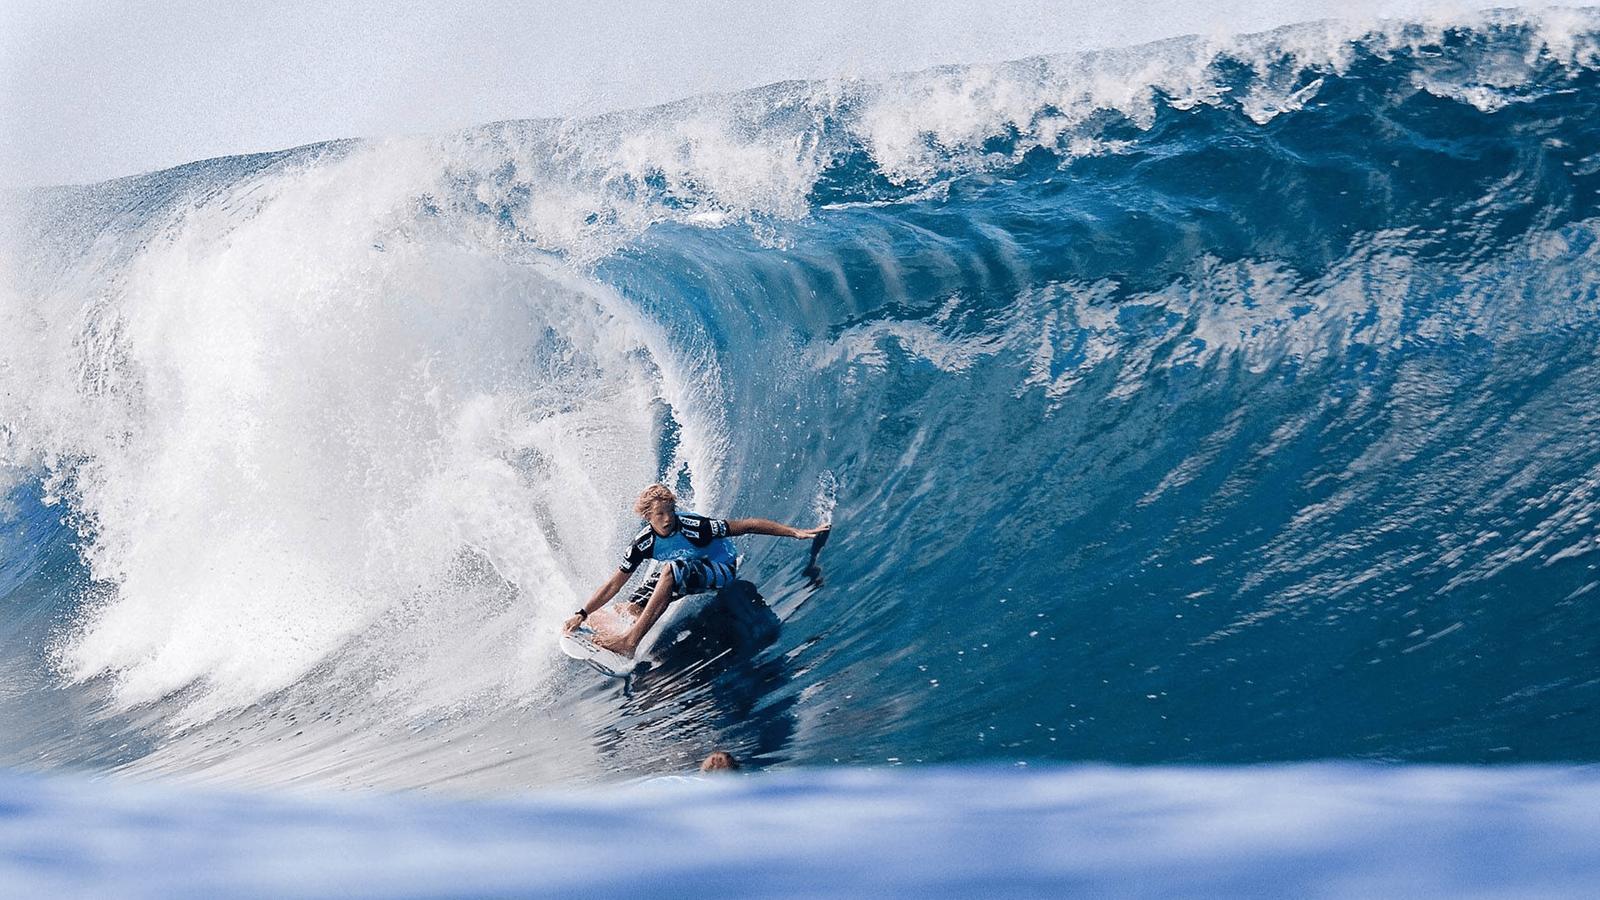 Natur Wallpaper Hd Hawaii Surferparadies Inseln Kultur Planet Wissen